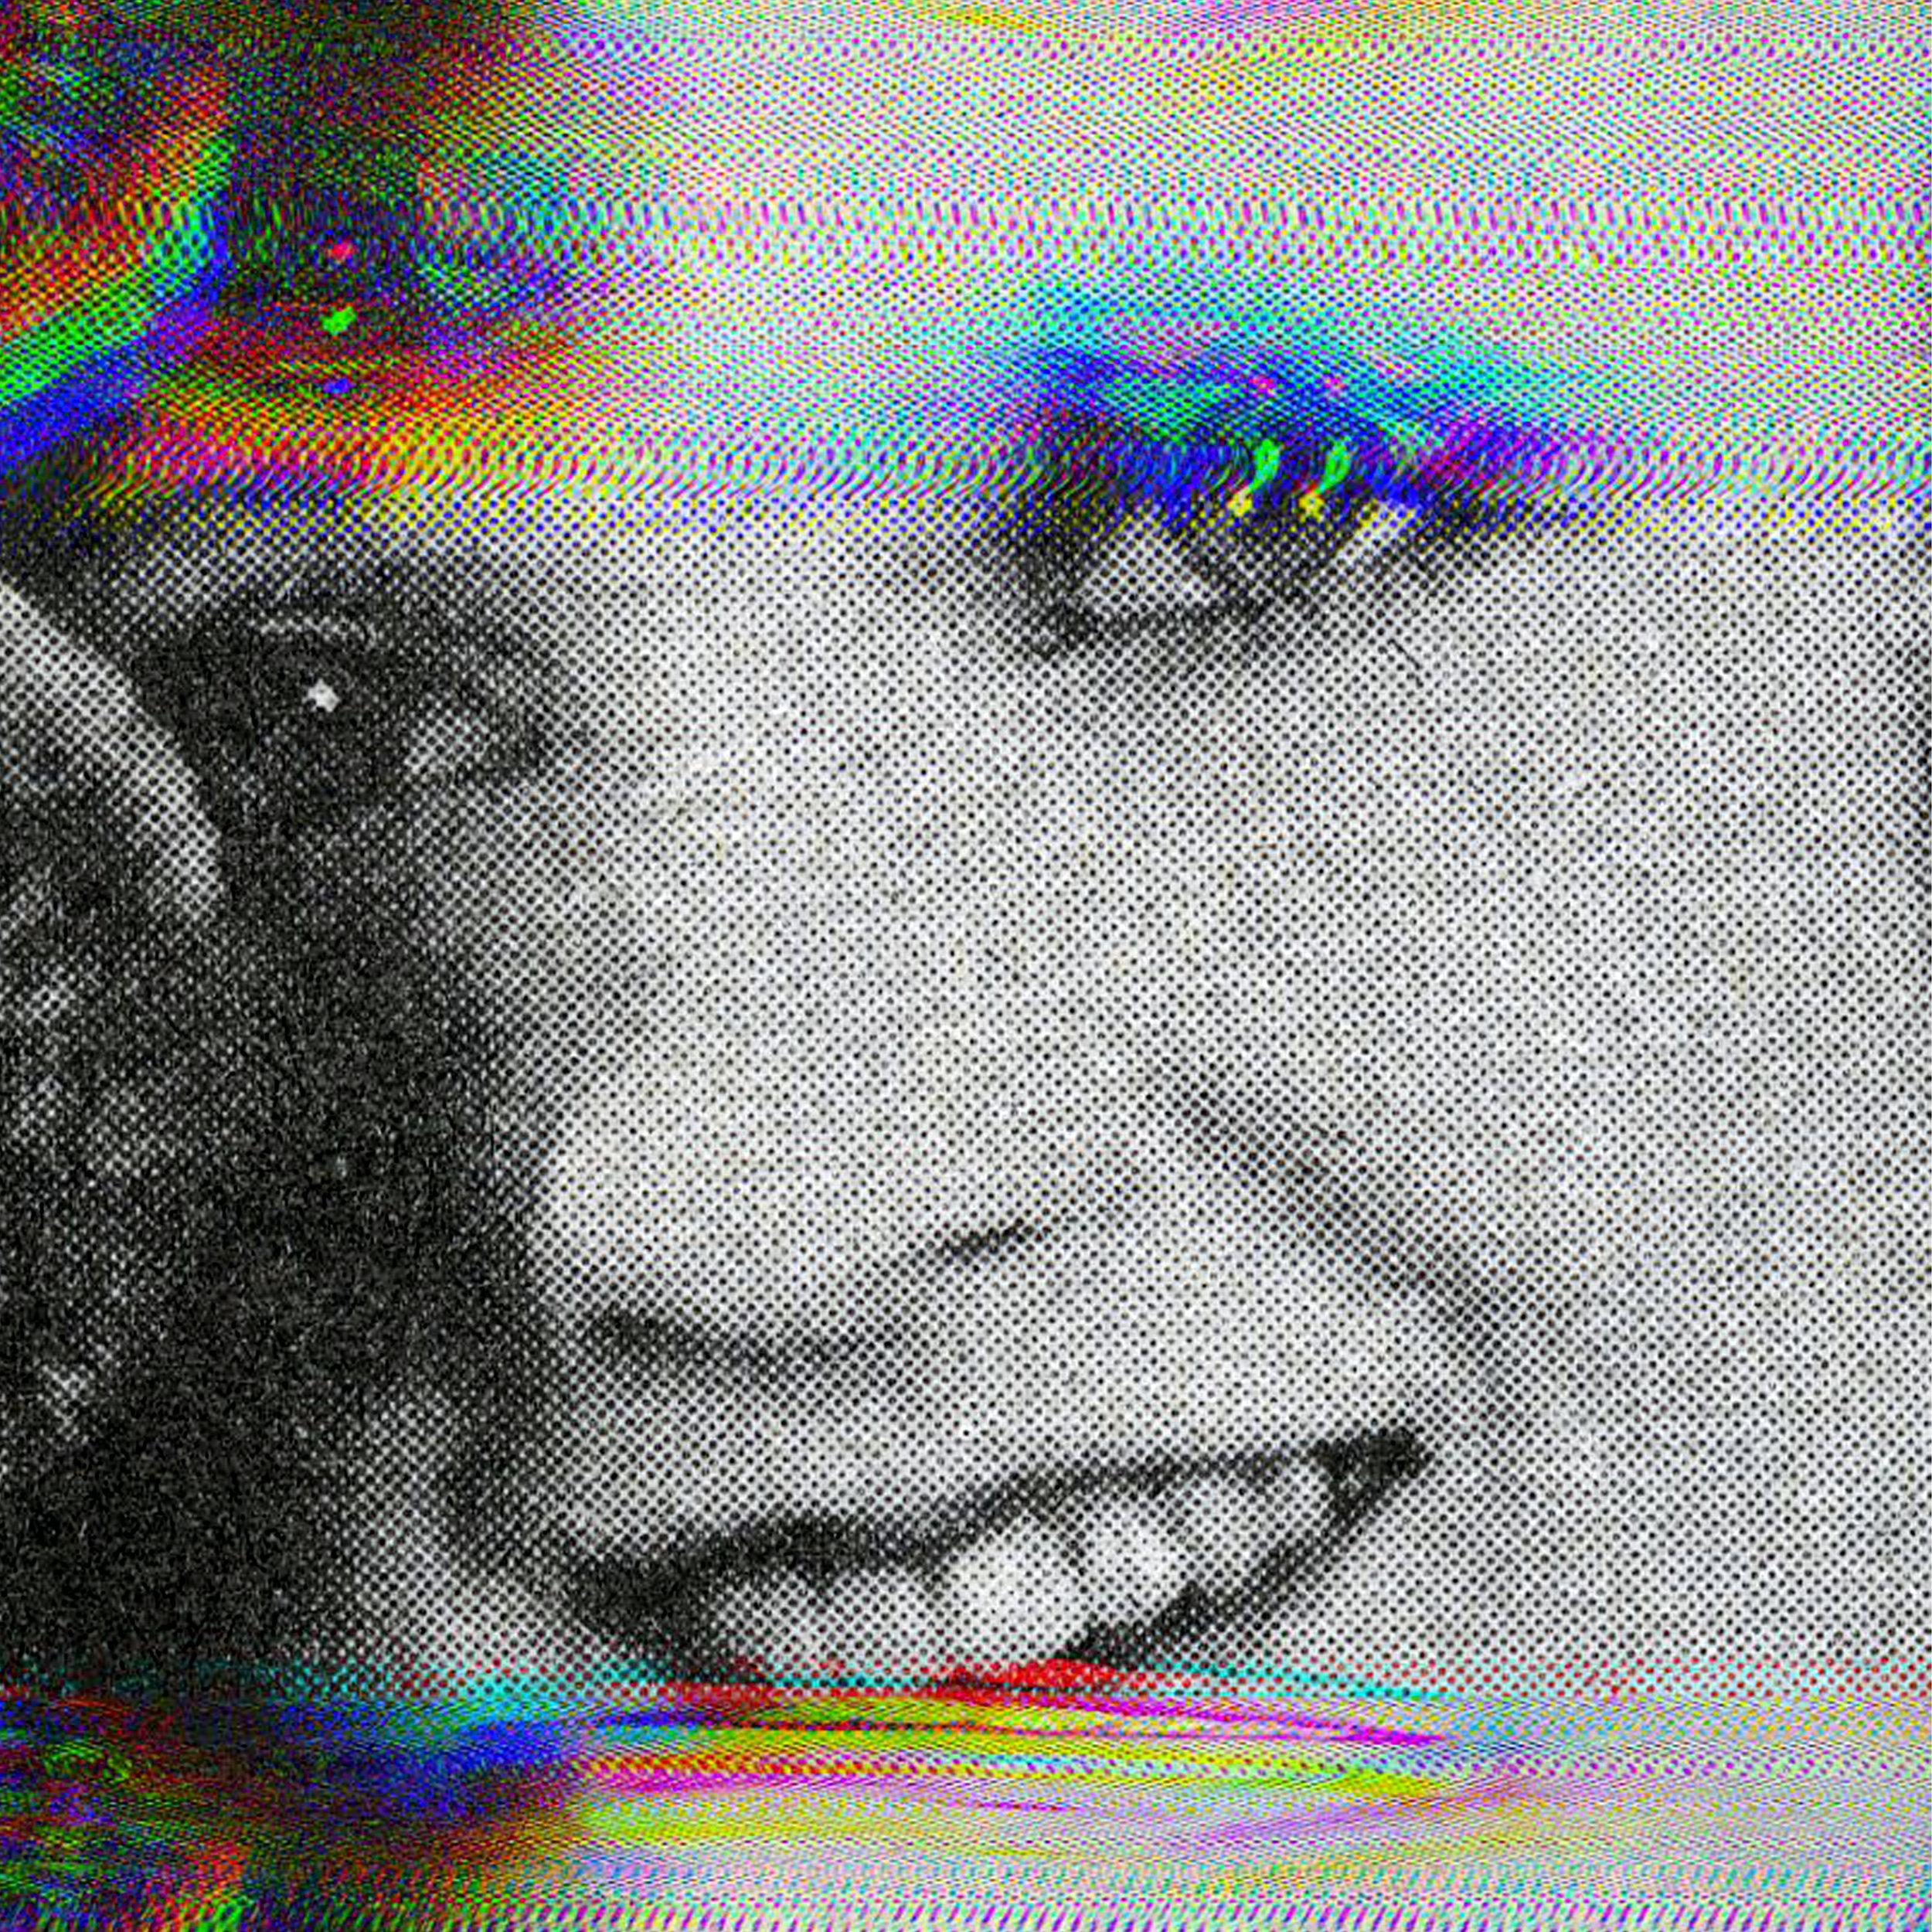 fyvr_almost happy album art_by Chirophelia.jpg